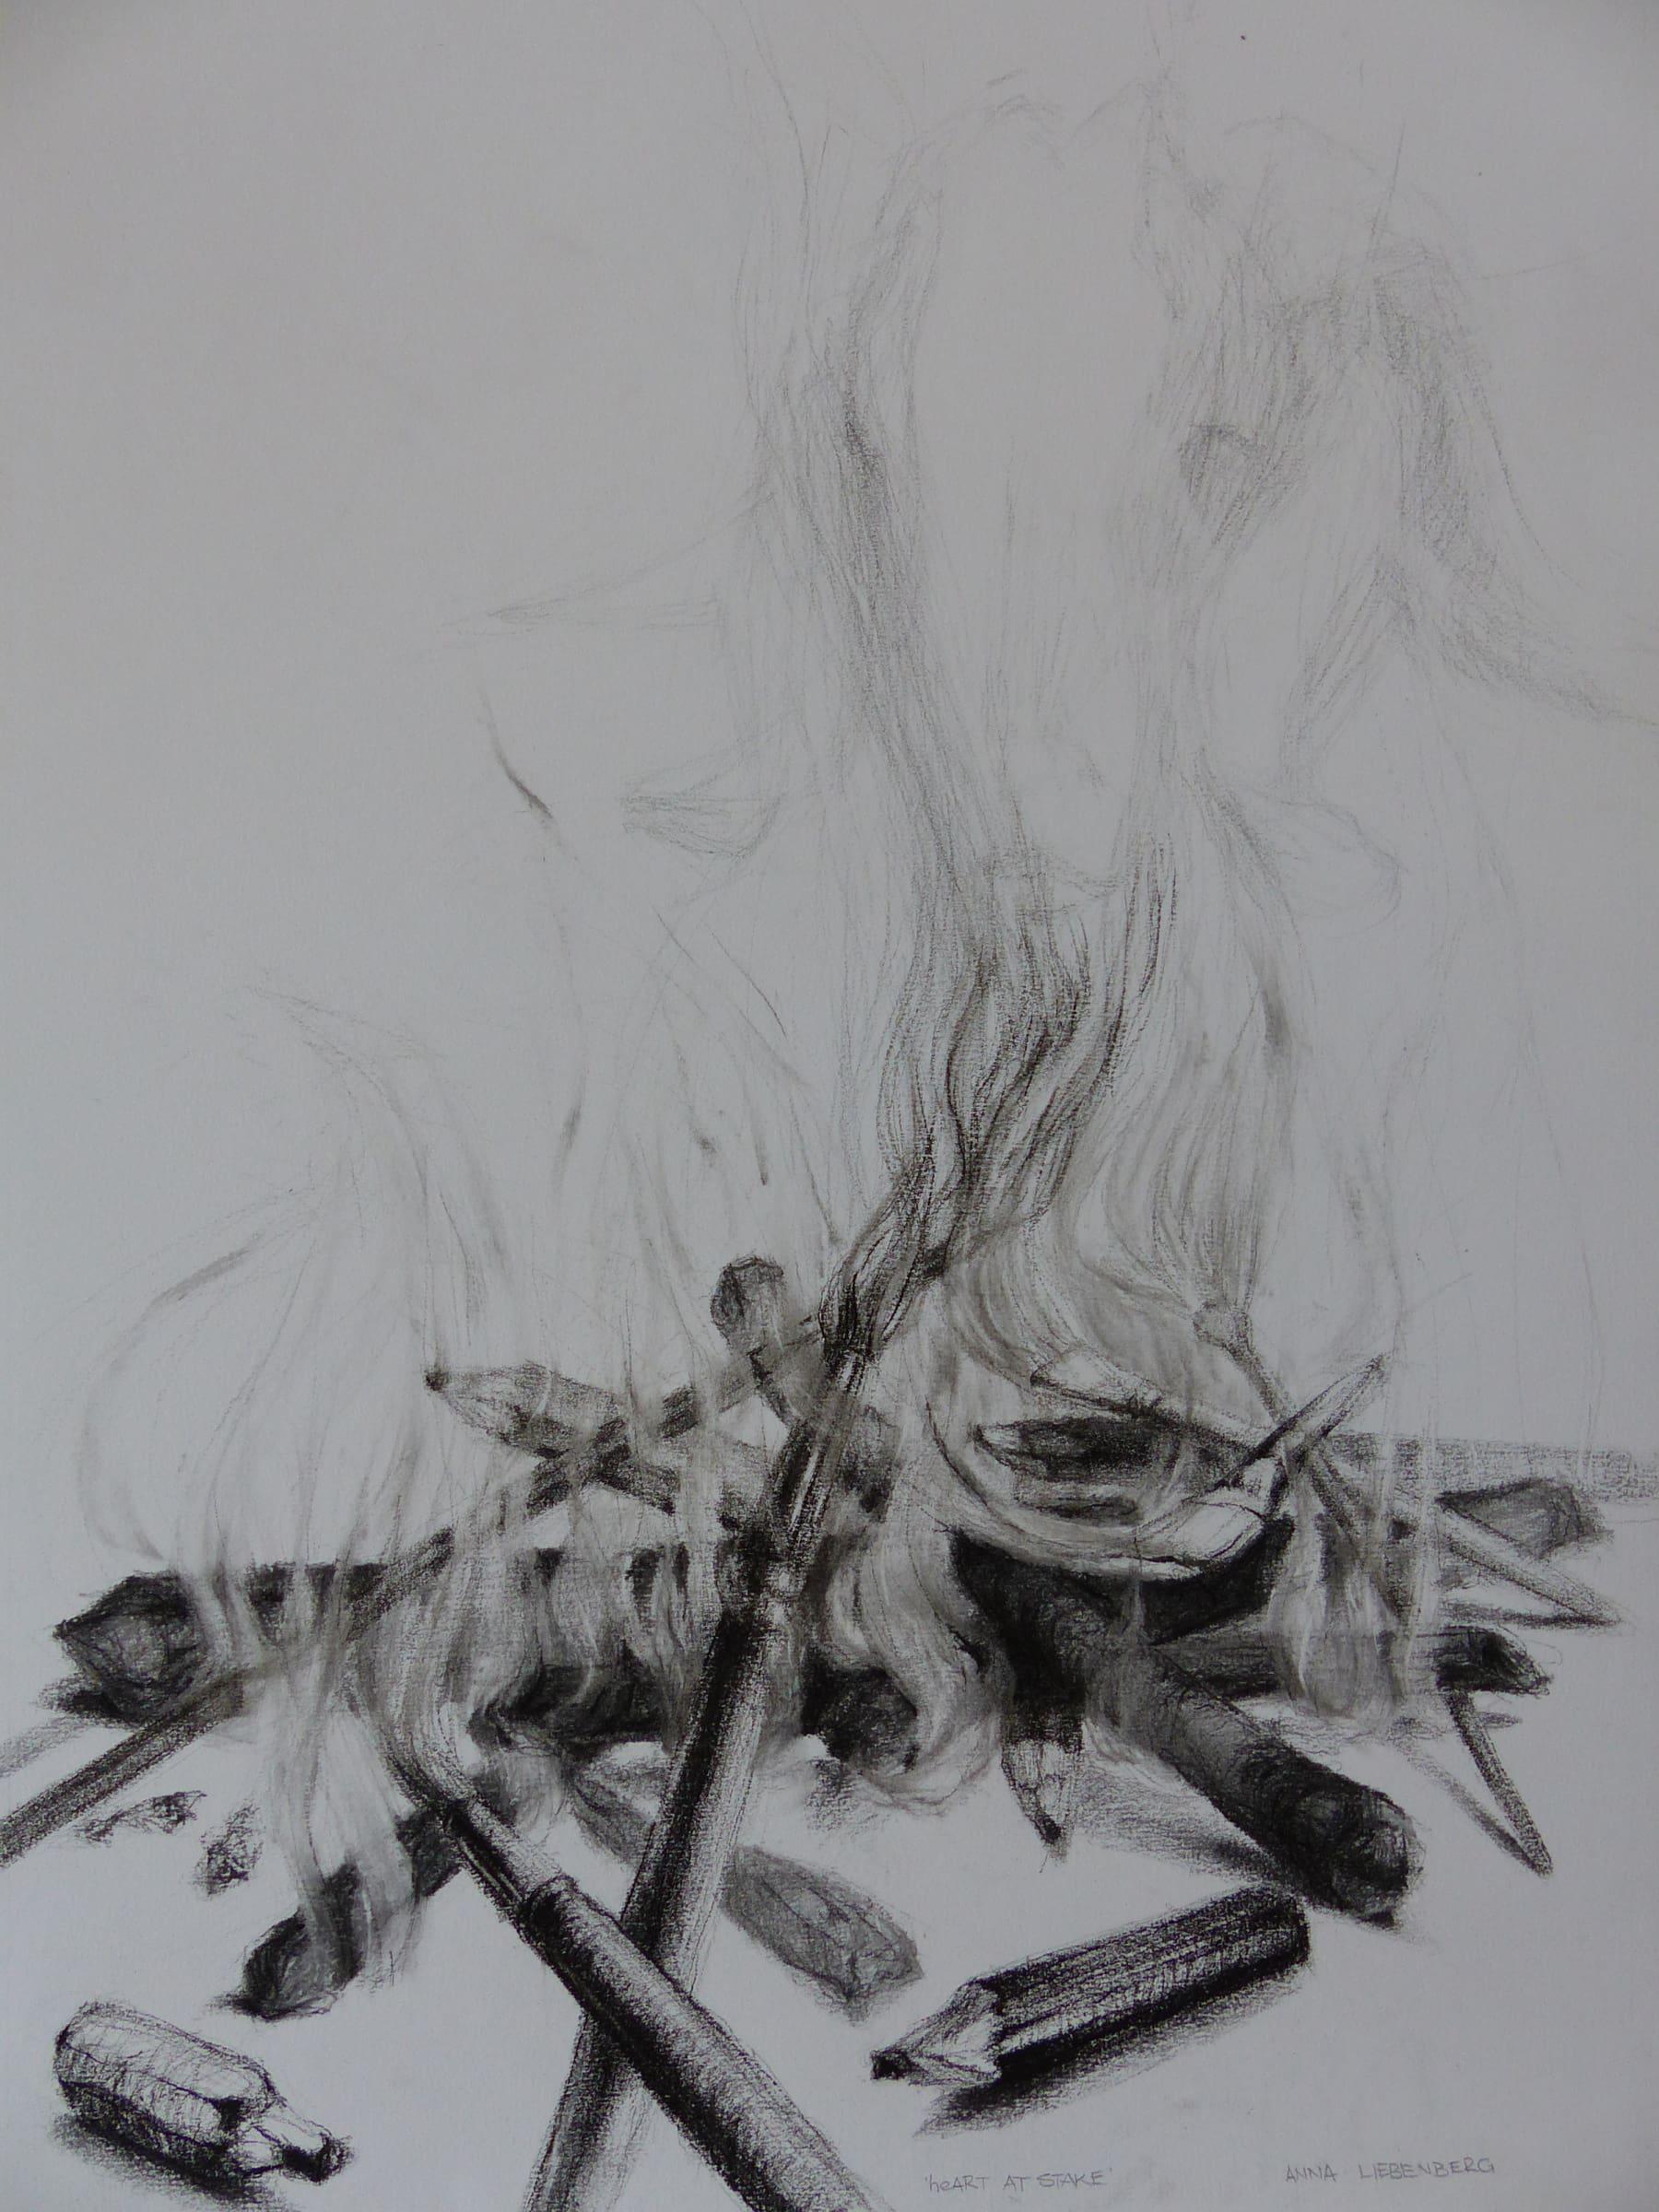 <span class=&#34;link fancybox-details-link&#34;><a href=&#34;/artworks/992-anna-liebenberg-heart-stake-2016/&#34;>View Detail Page</a></span><div class=&#34;artist&#34;><strong>Anna Liebenberg</strong></div> <div class=&#34;title&#34;><em>Heart@Stake</em>, 2016</div> <div class=&#34;medium&#34;>Charcoal On Fabriano</div> <div class=&#34;dimensions&#34;>59cm x 42cm</div><div class=&#34;price&#34;>R3,850.00</div>